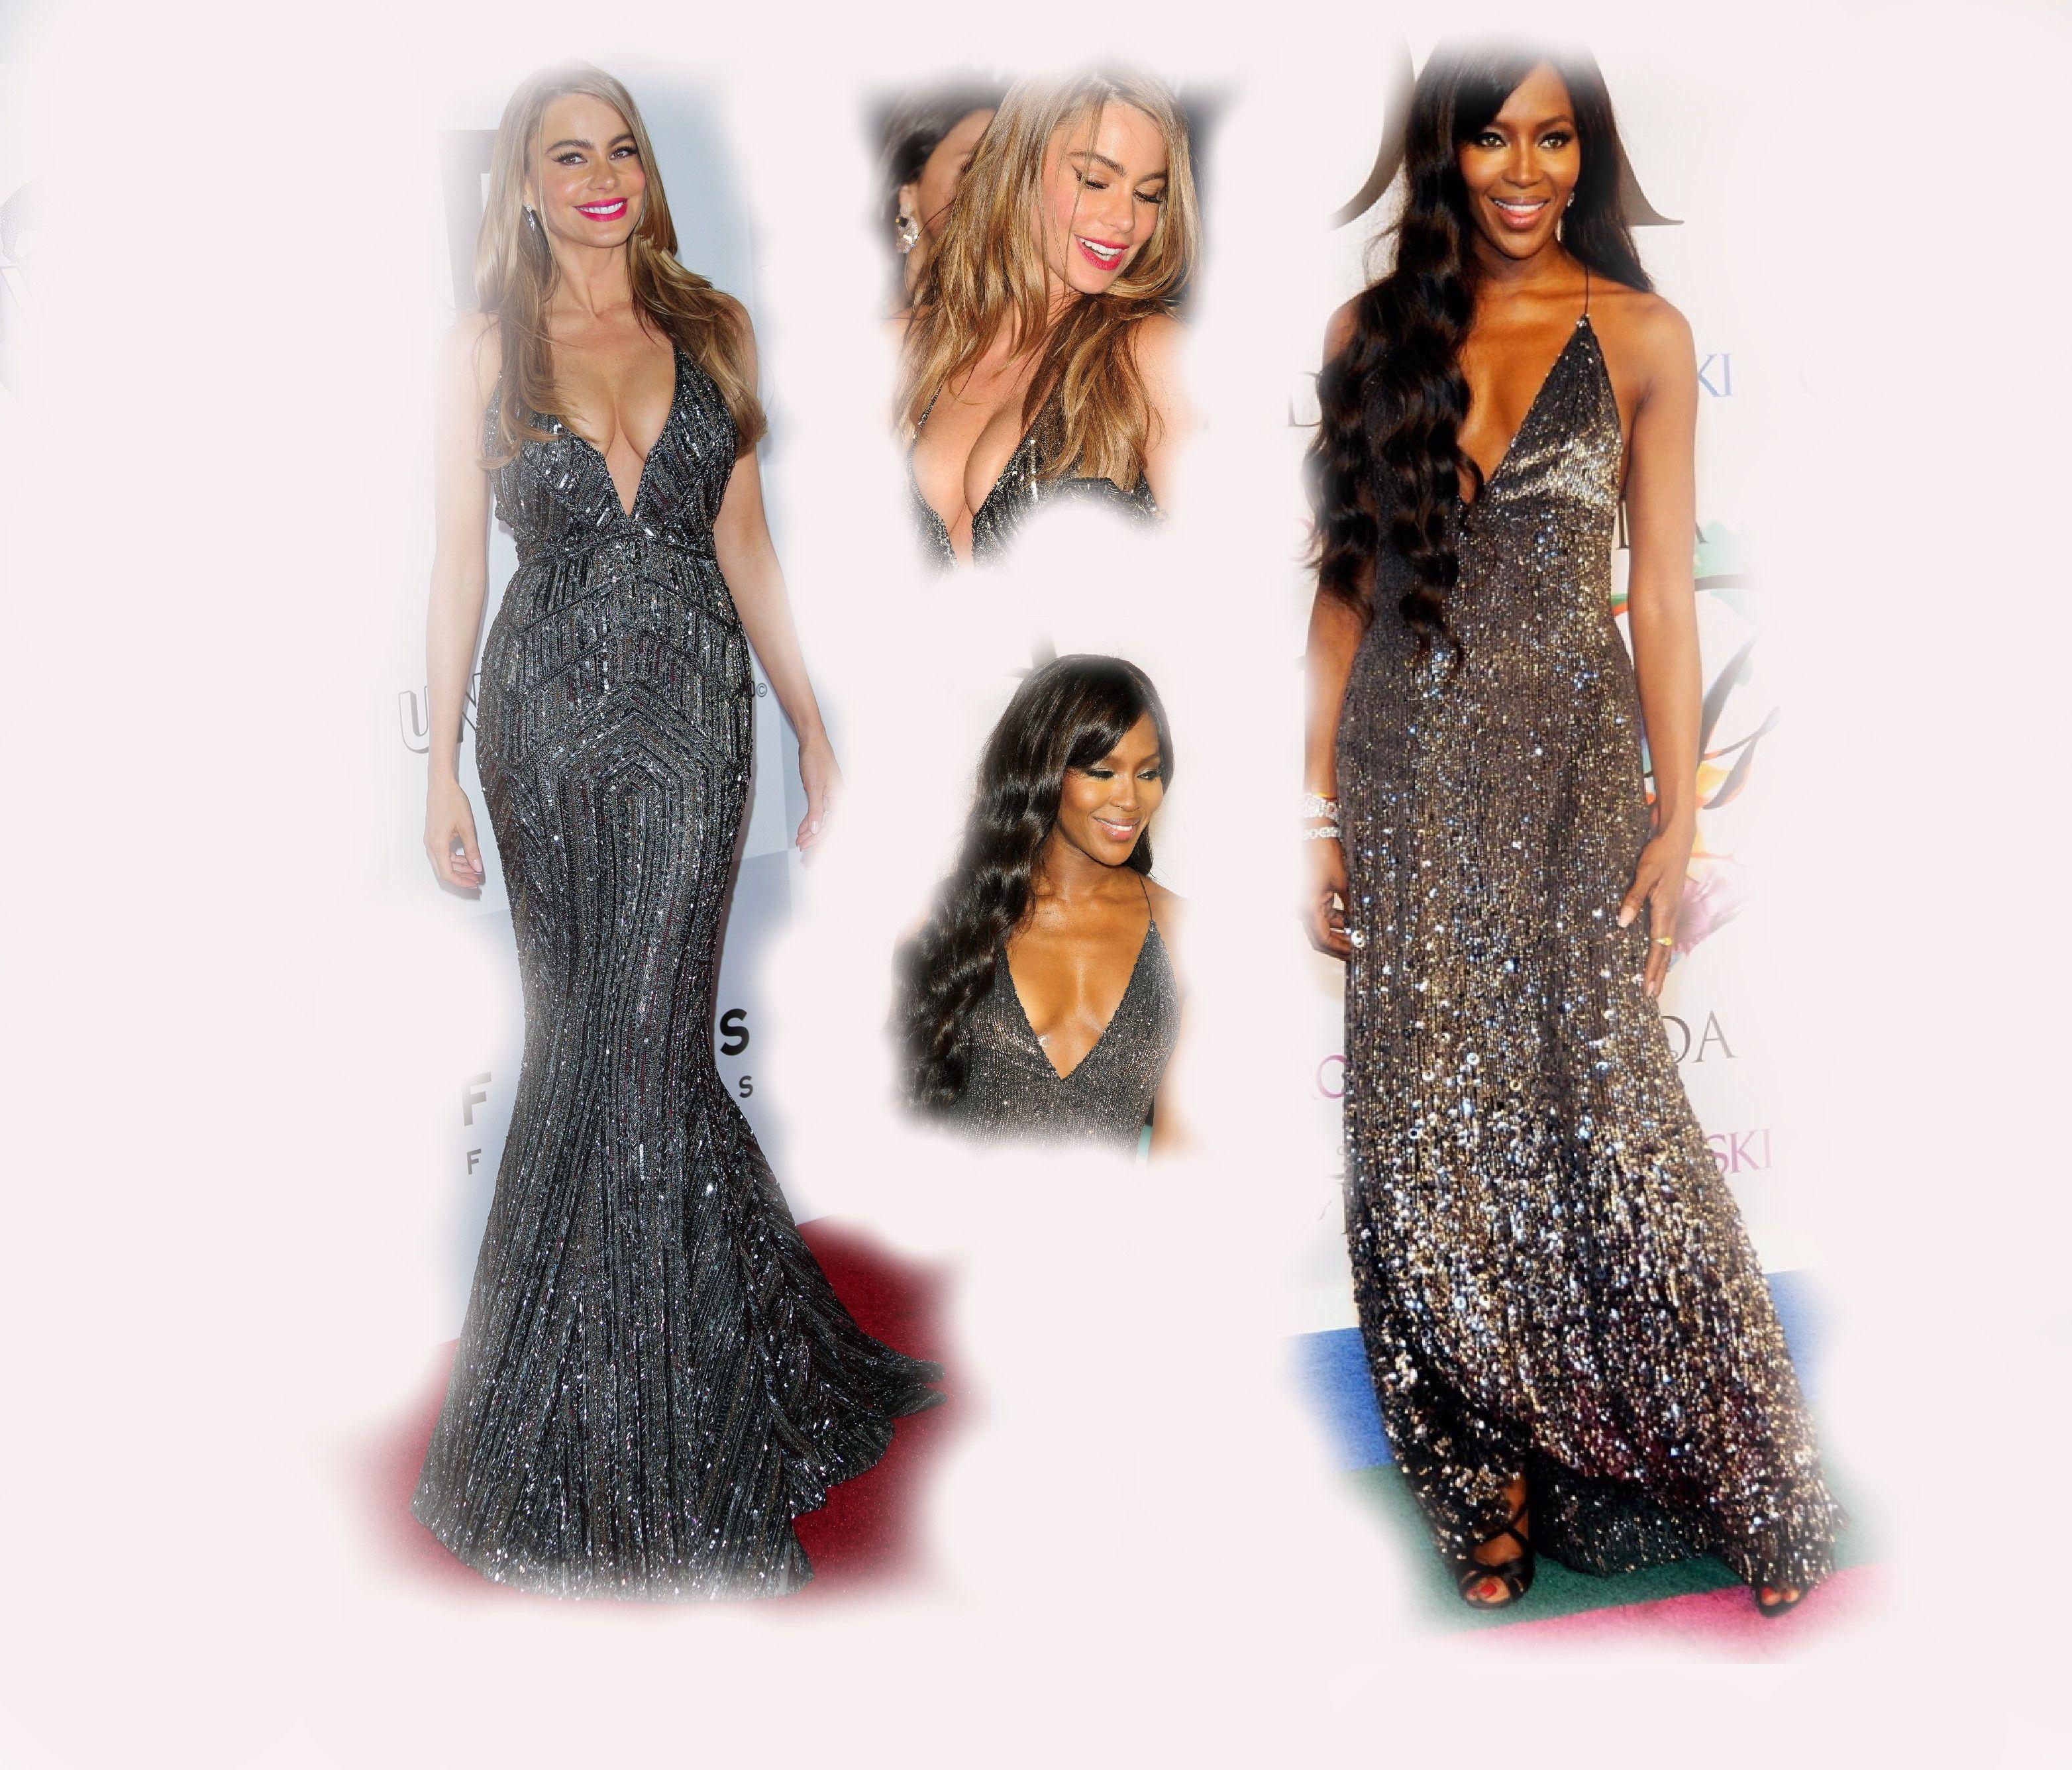 shiny grey long dress, Sofia Vergara VS Naomi Campbell fashion diva who-wore-it-better celeb celebrity